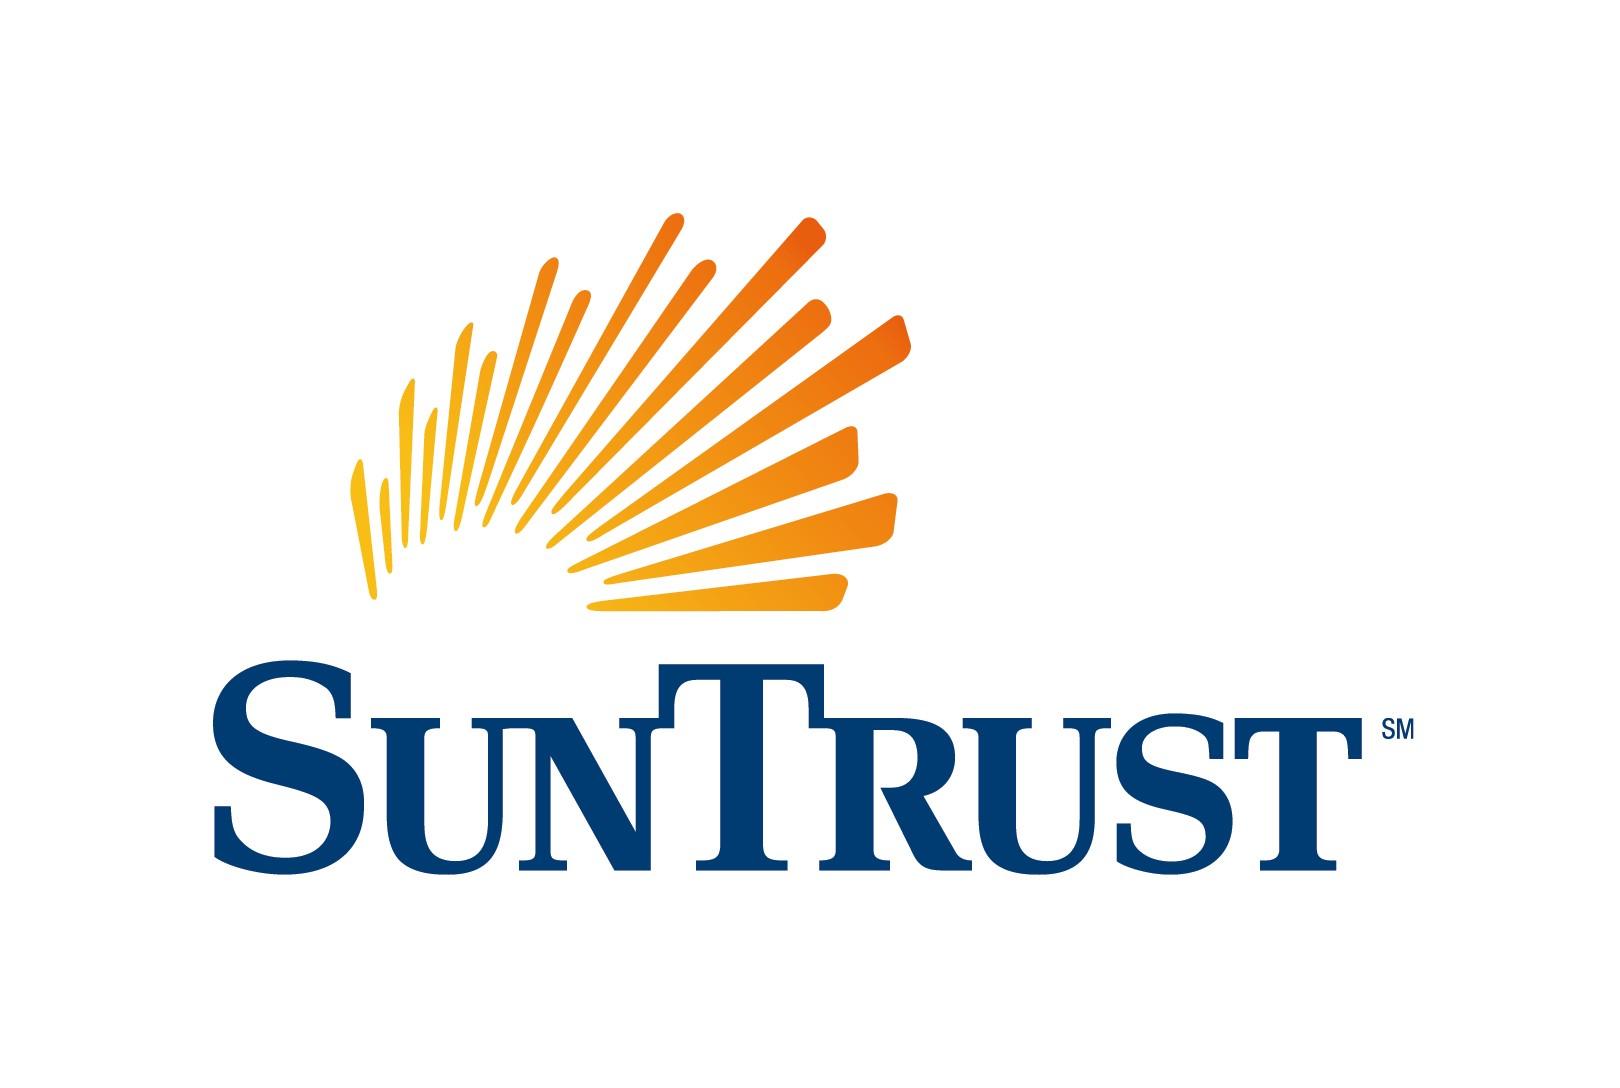 Logo: Sun: Solar Logos, Datsun, Bacardi Illuminati ...